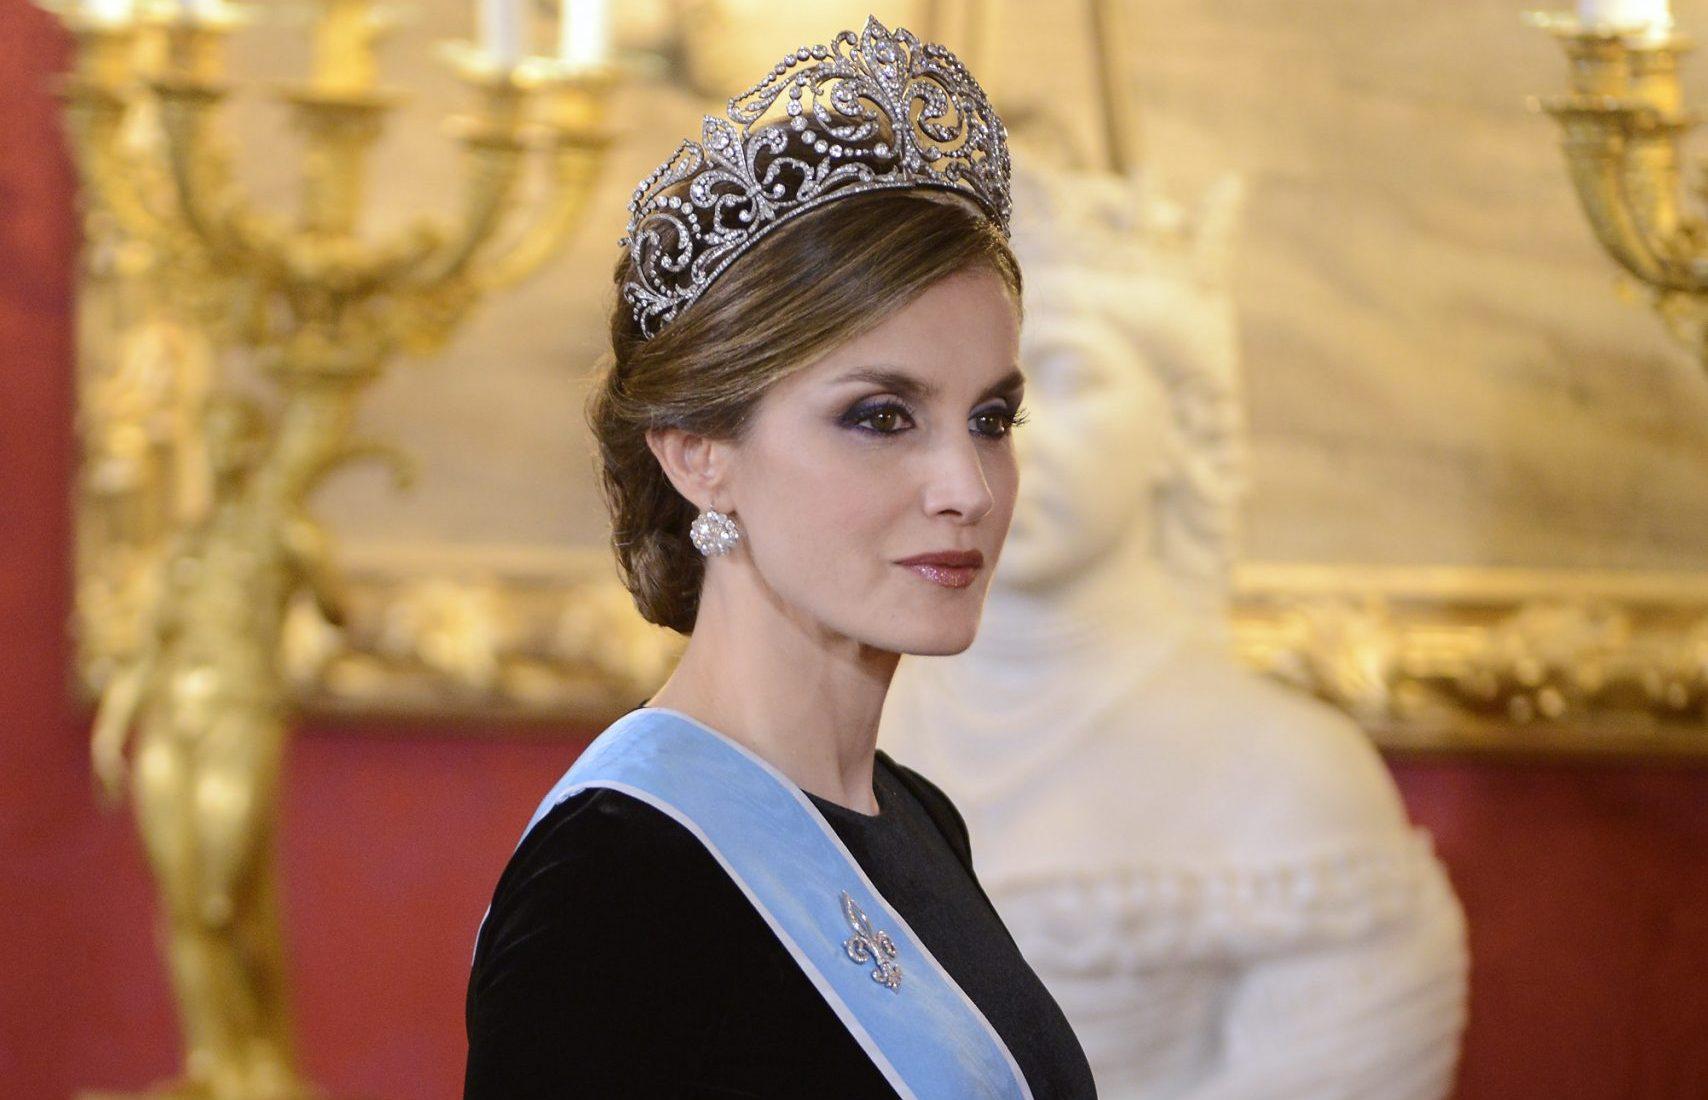 La reina Letizia con al tiara Flor de Lis